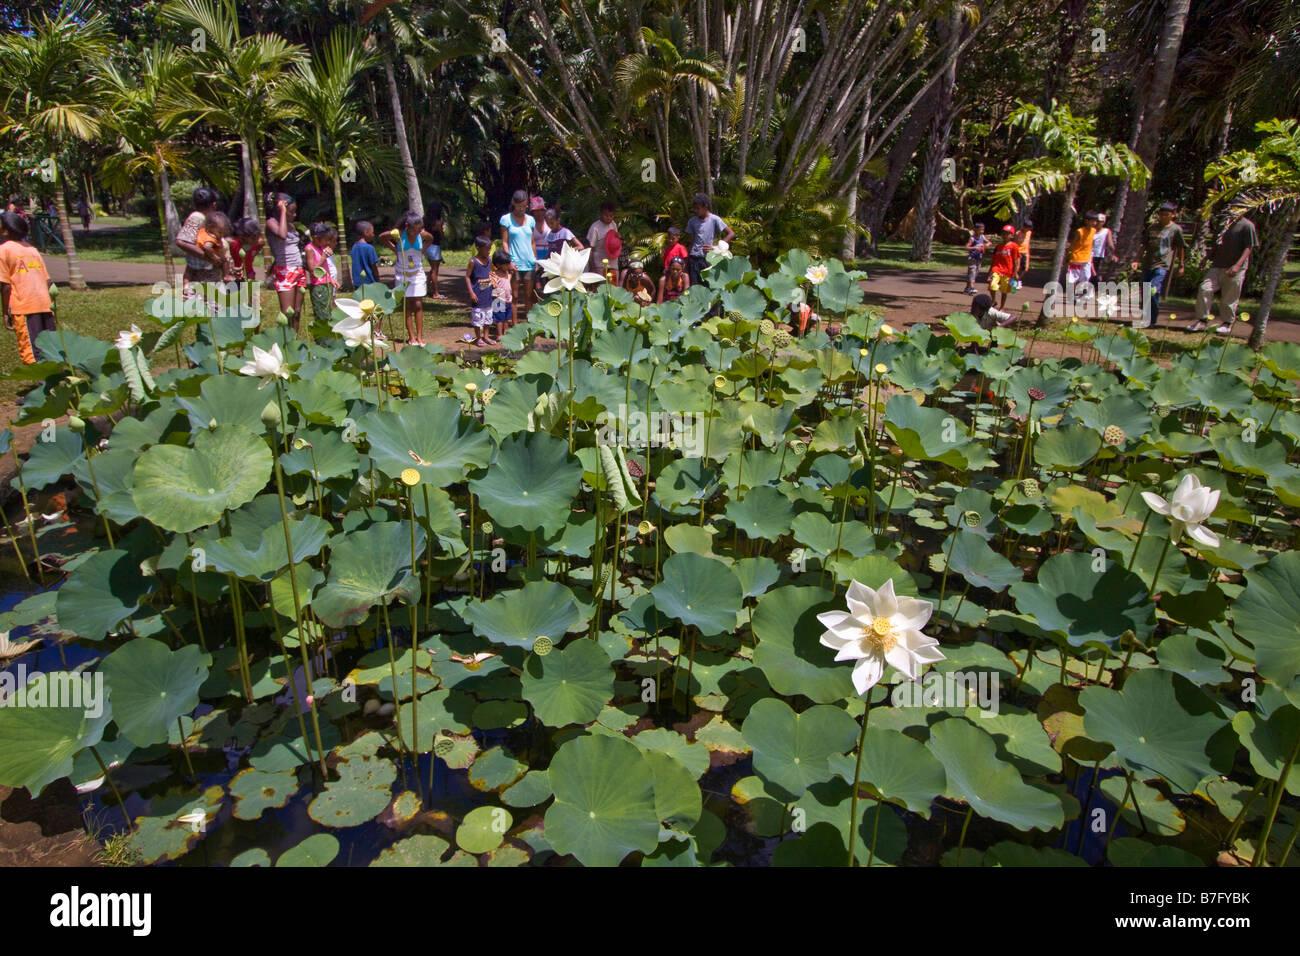 Mauritius africa nymphea lotus flower tank in sir seewoosagur stock mauritius africa nymphea lotus flower tank in sir seewoosagur ramgoolam royal botanical garden of pamplemousses school class mau mightylinksfo